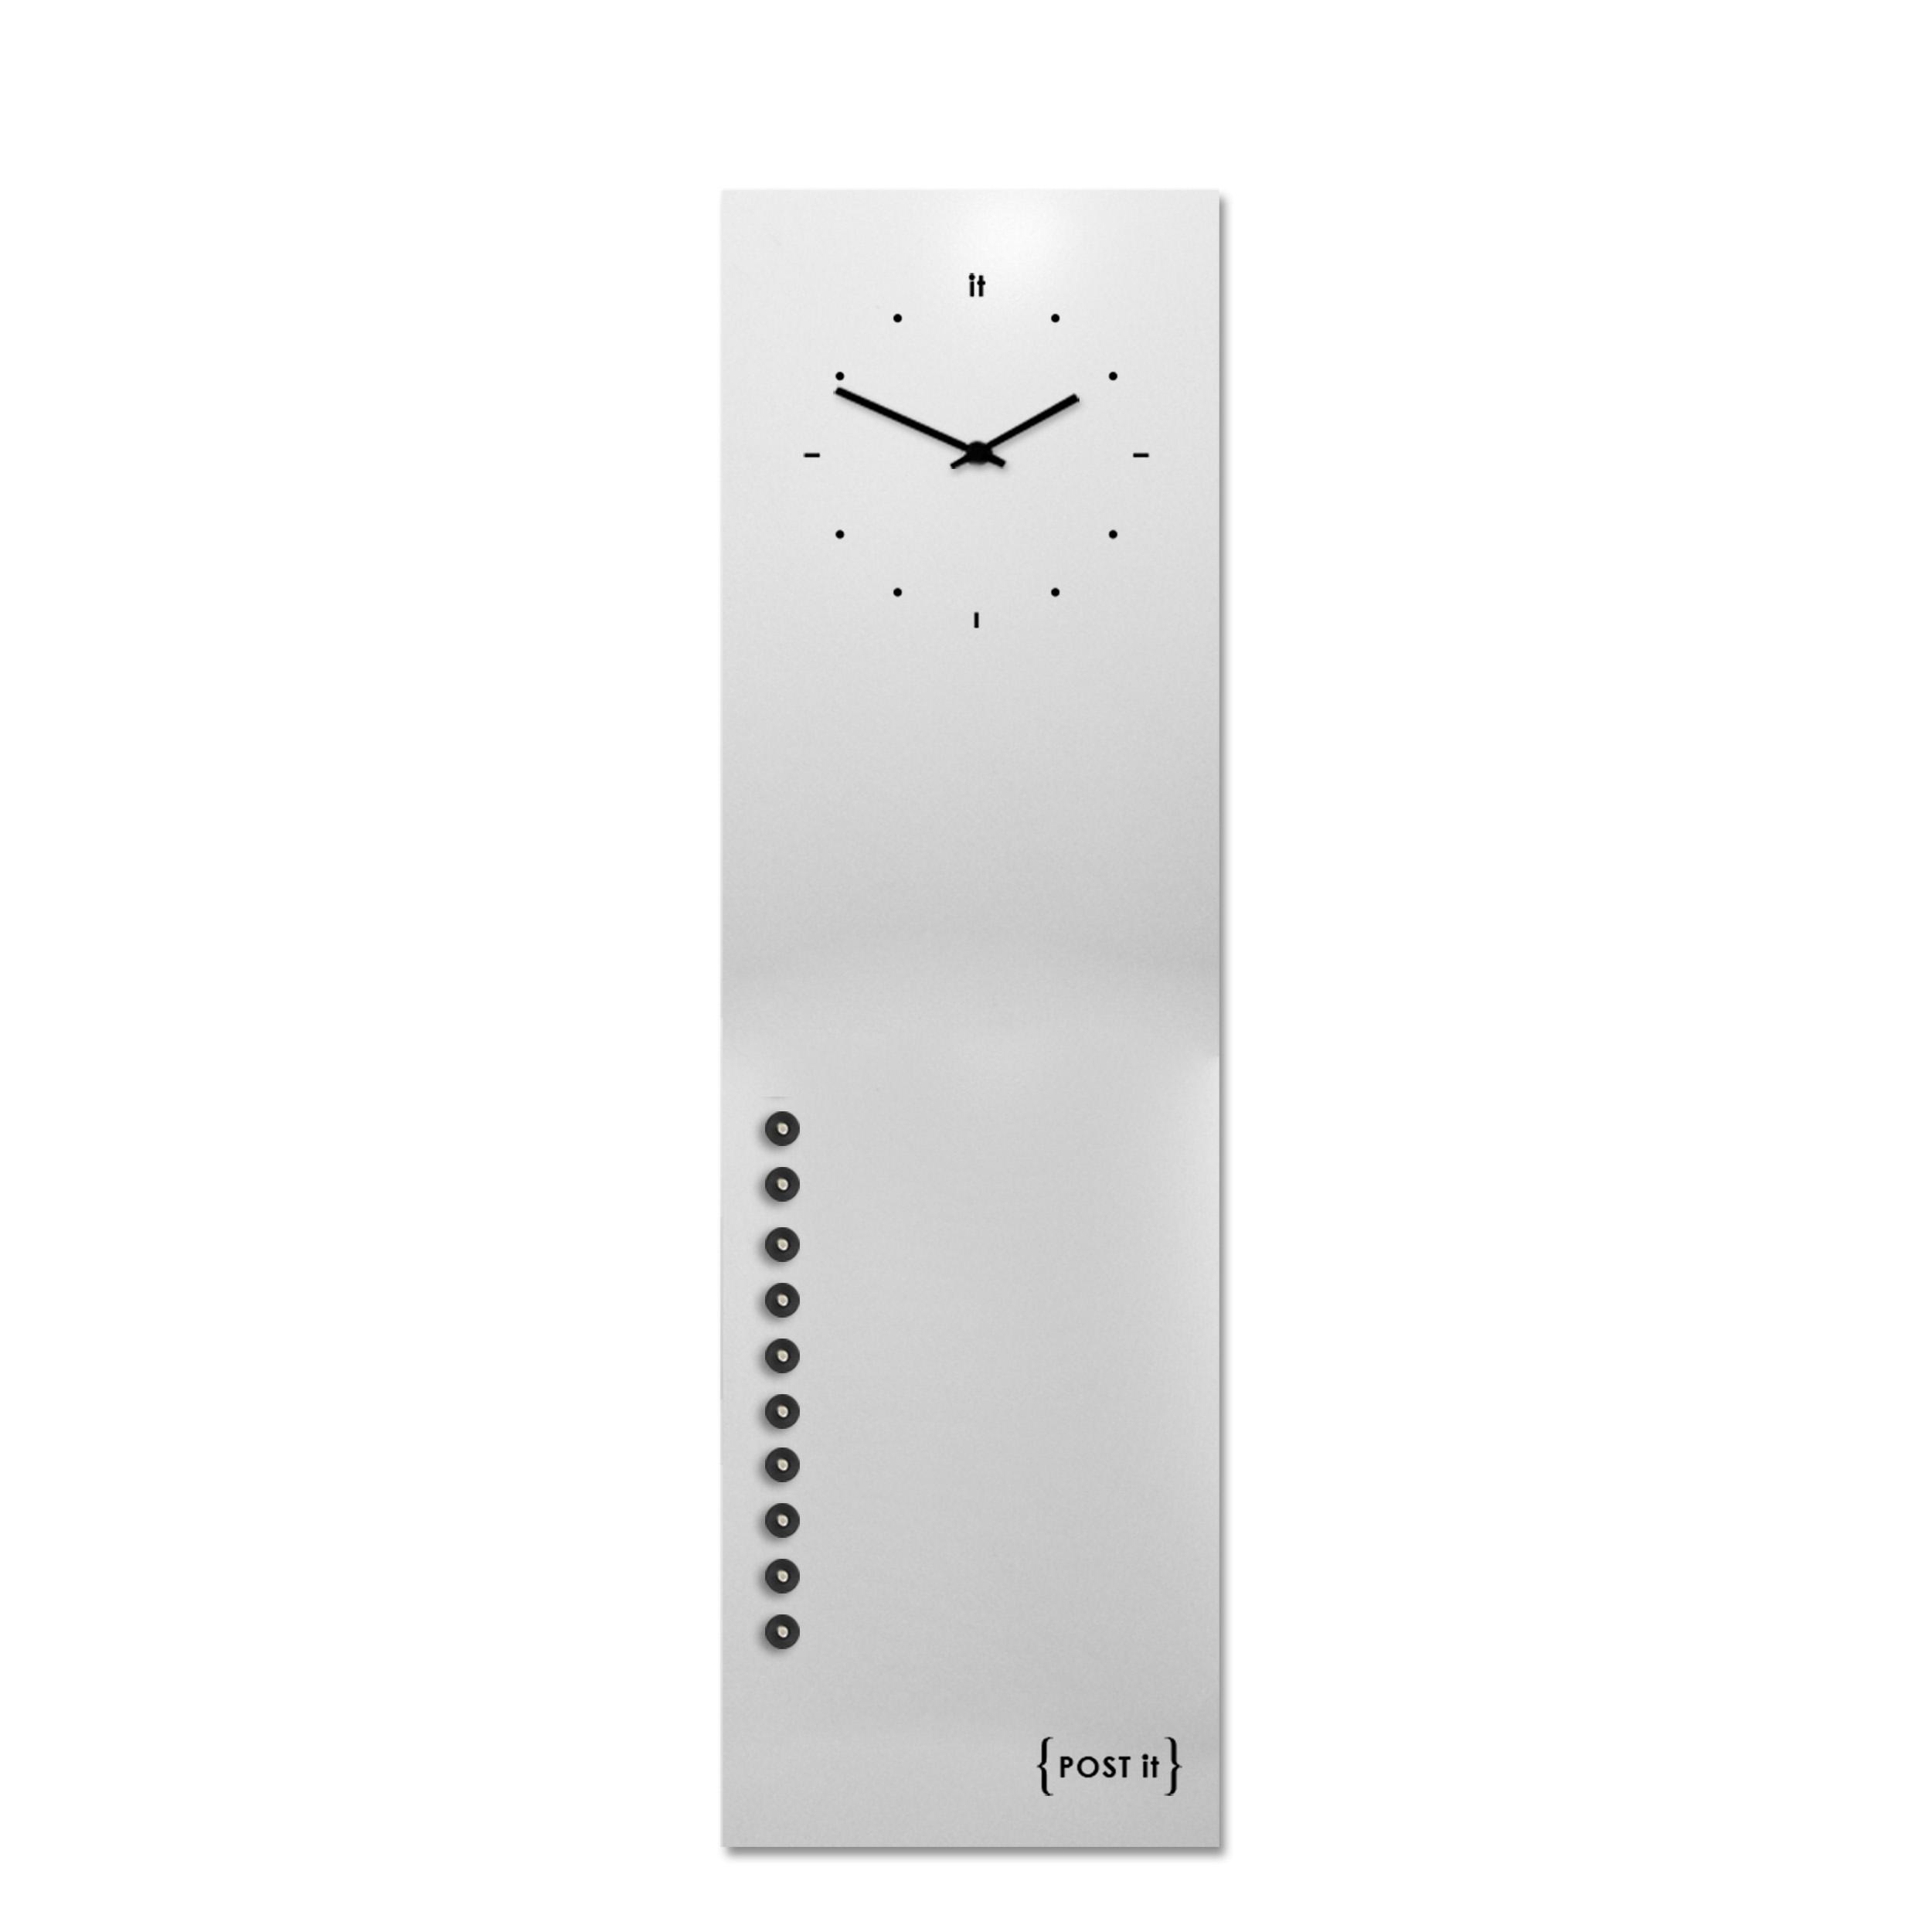 design-clock-magnetic-board-orologio-lavagna-magnetica-post it-white-vertical-magnets